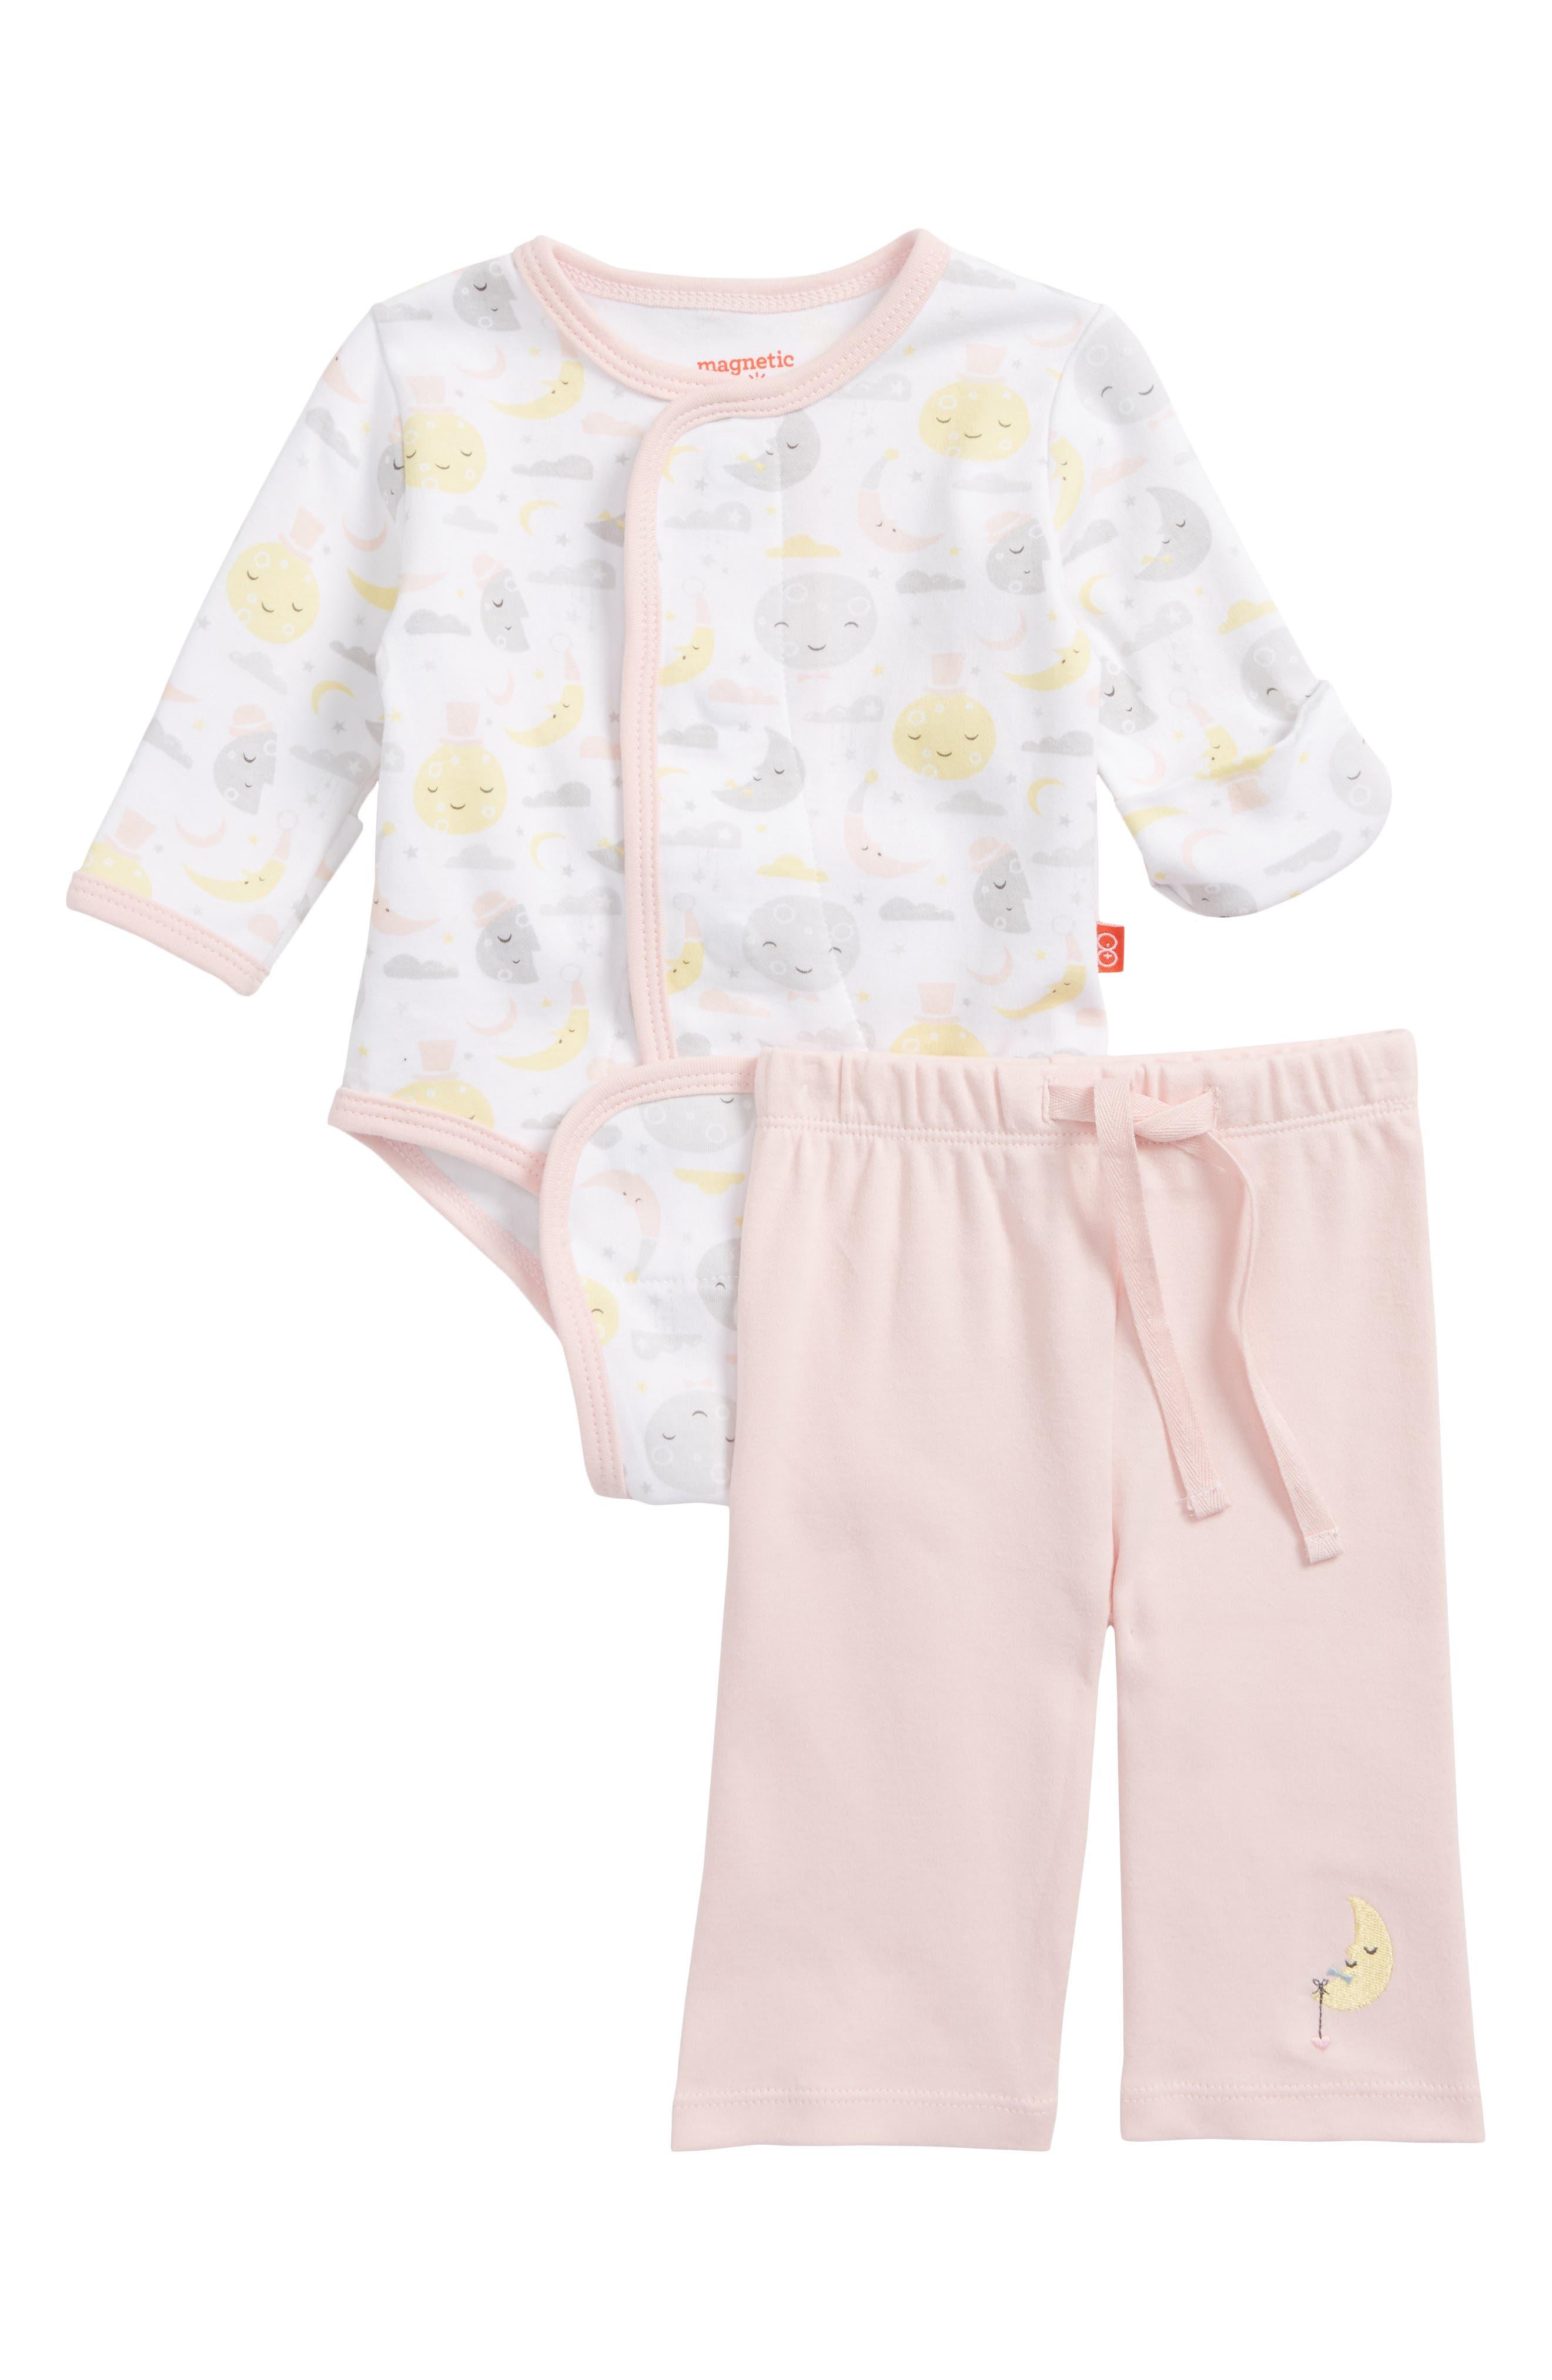 Magnetic Me To the Moon Bodysuit & Pants Set Baby Girls